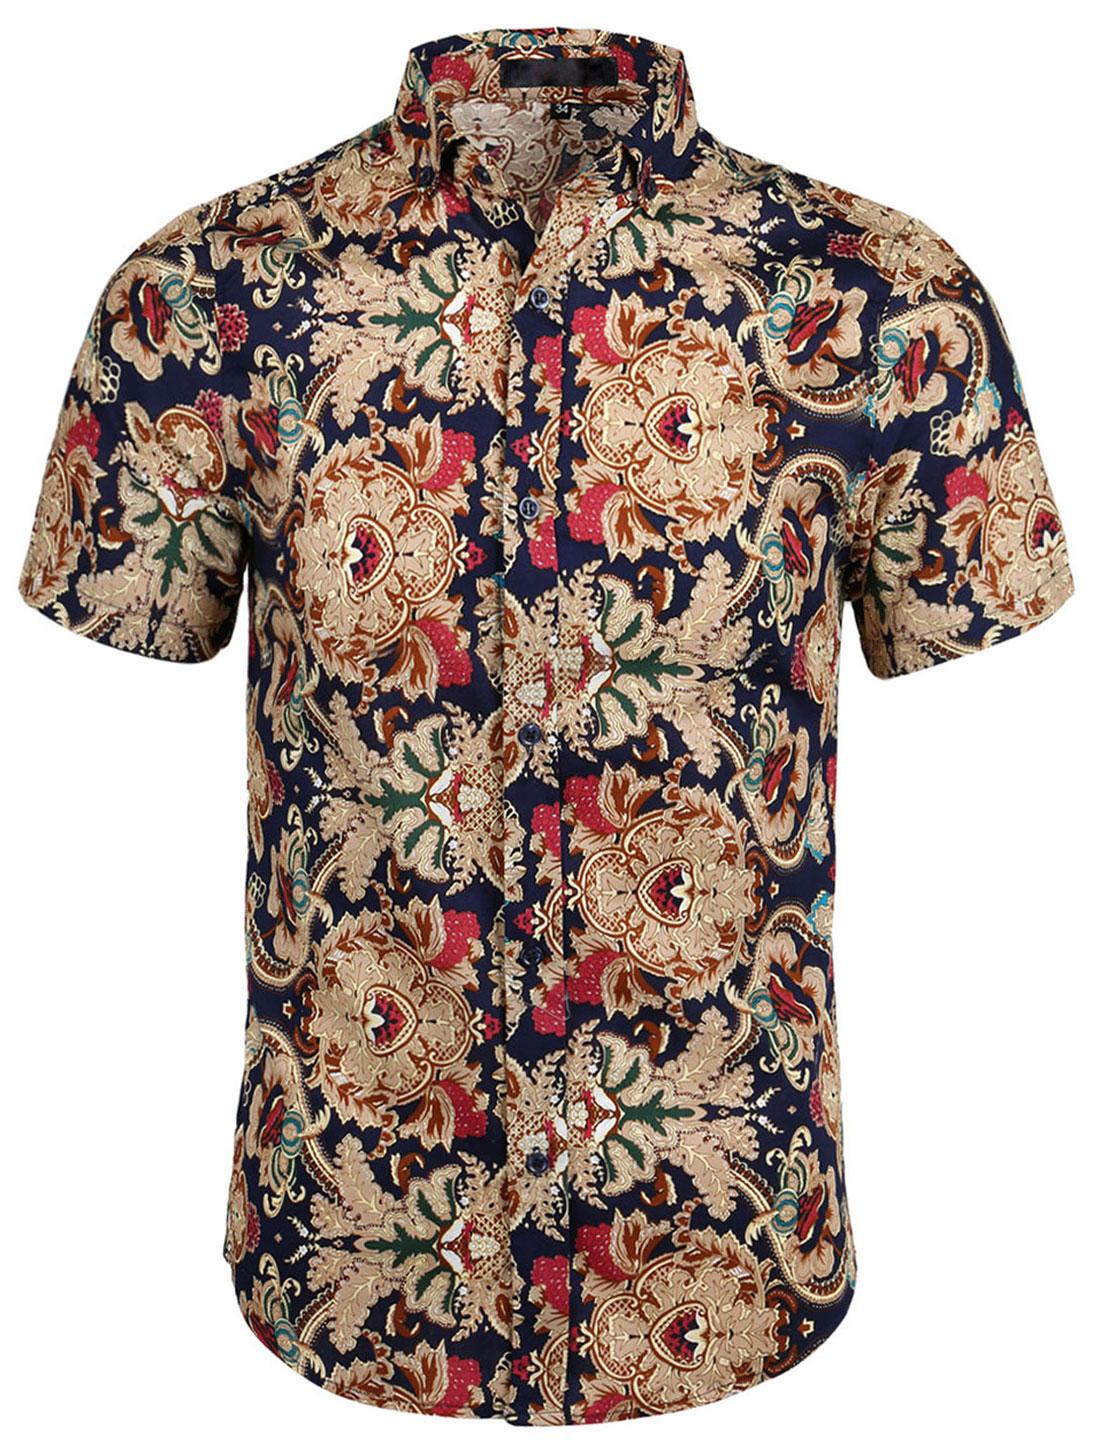 Men Short Sleeve Button Down Vintage Print Causal Hawaiian Shirt Navy Camel M